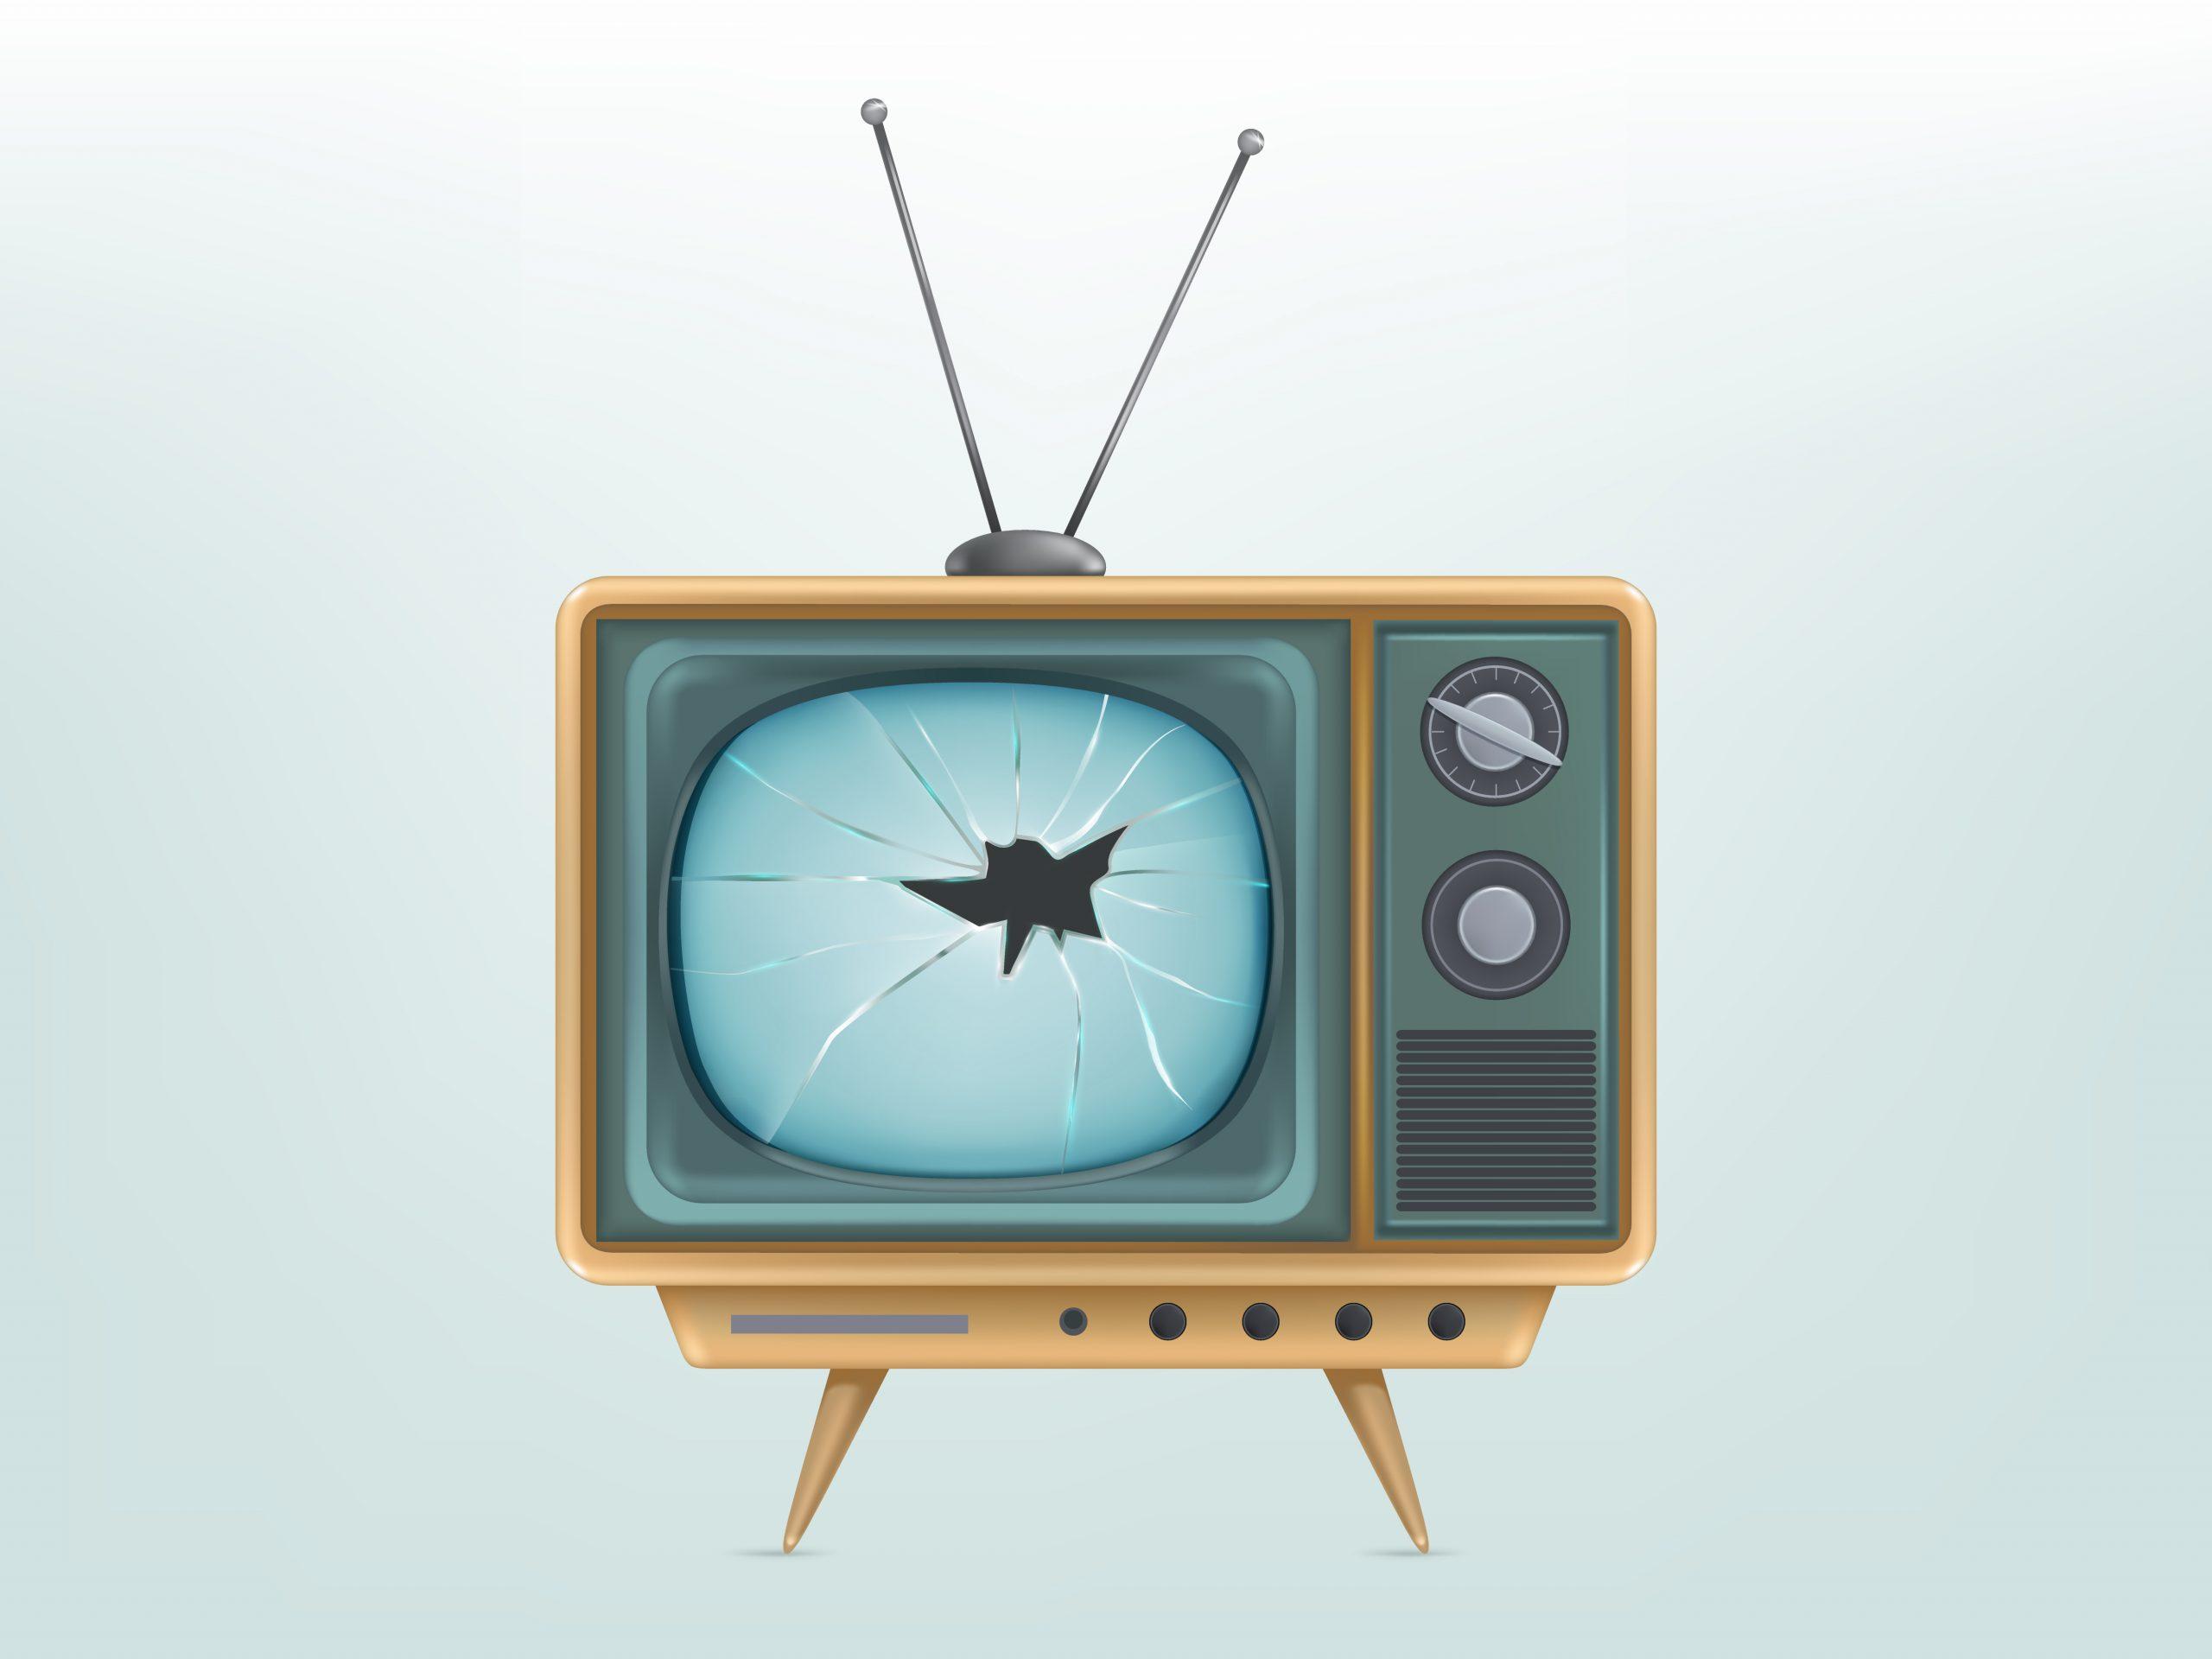 Vector Illustration Of Broken Retro Tv Set, Television. Injured Electric Video Display For Broadcasting, News.